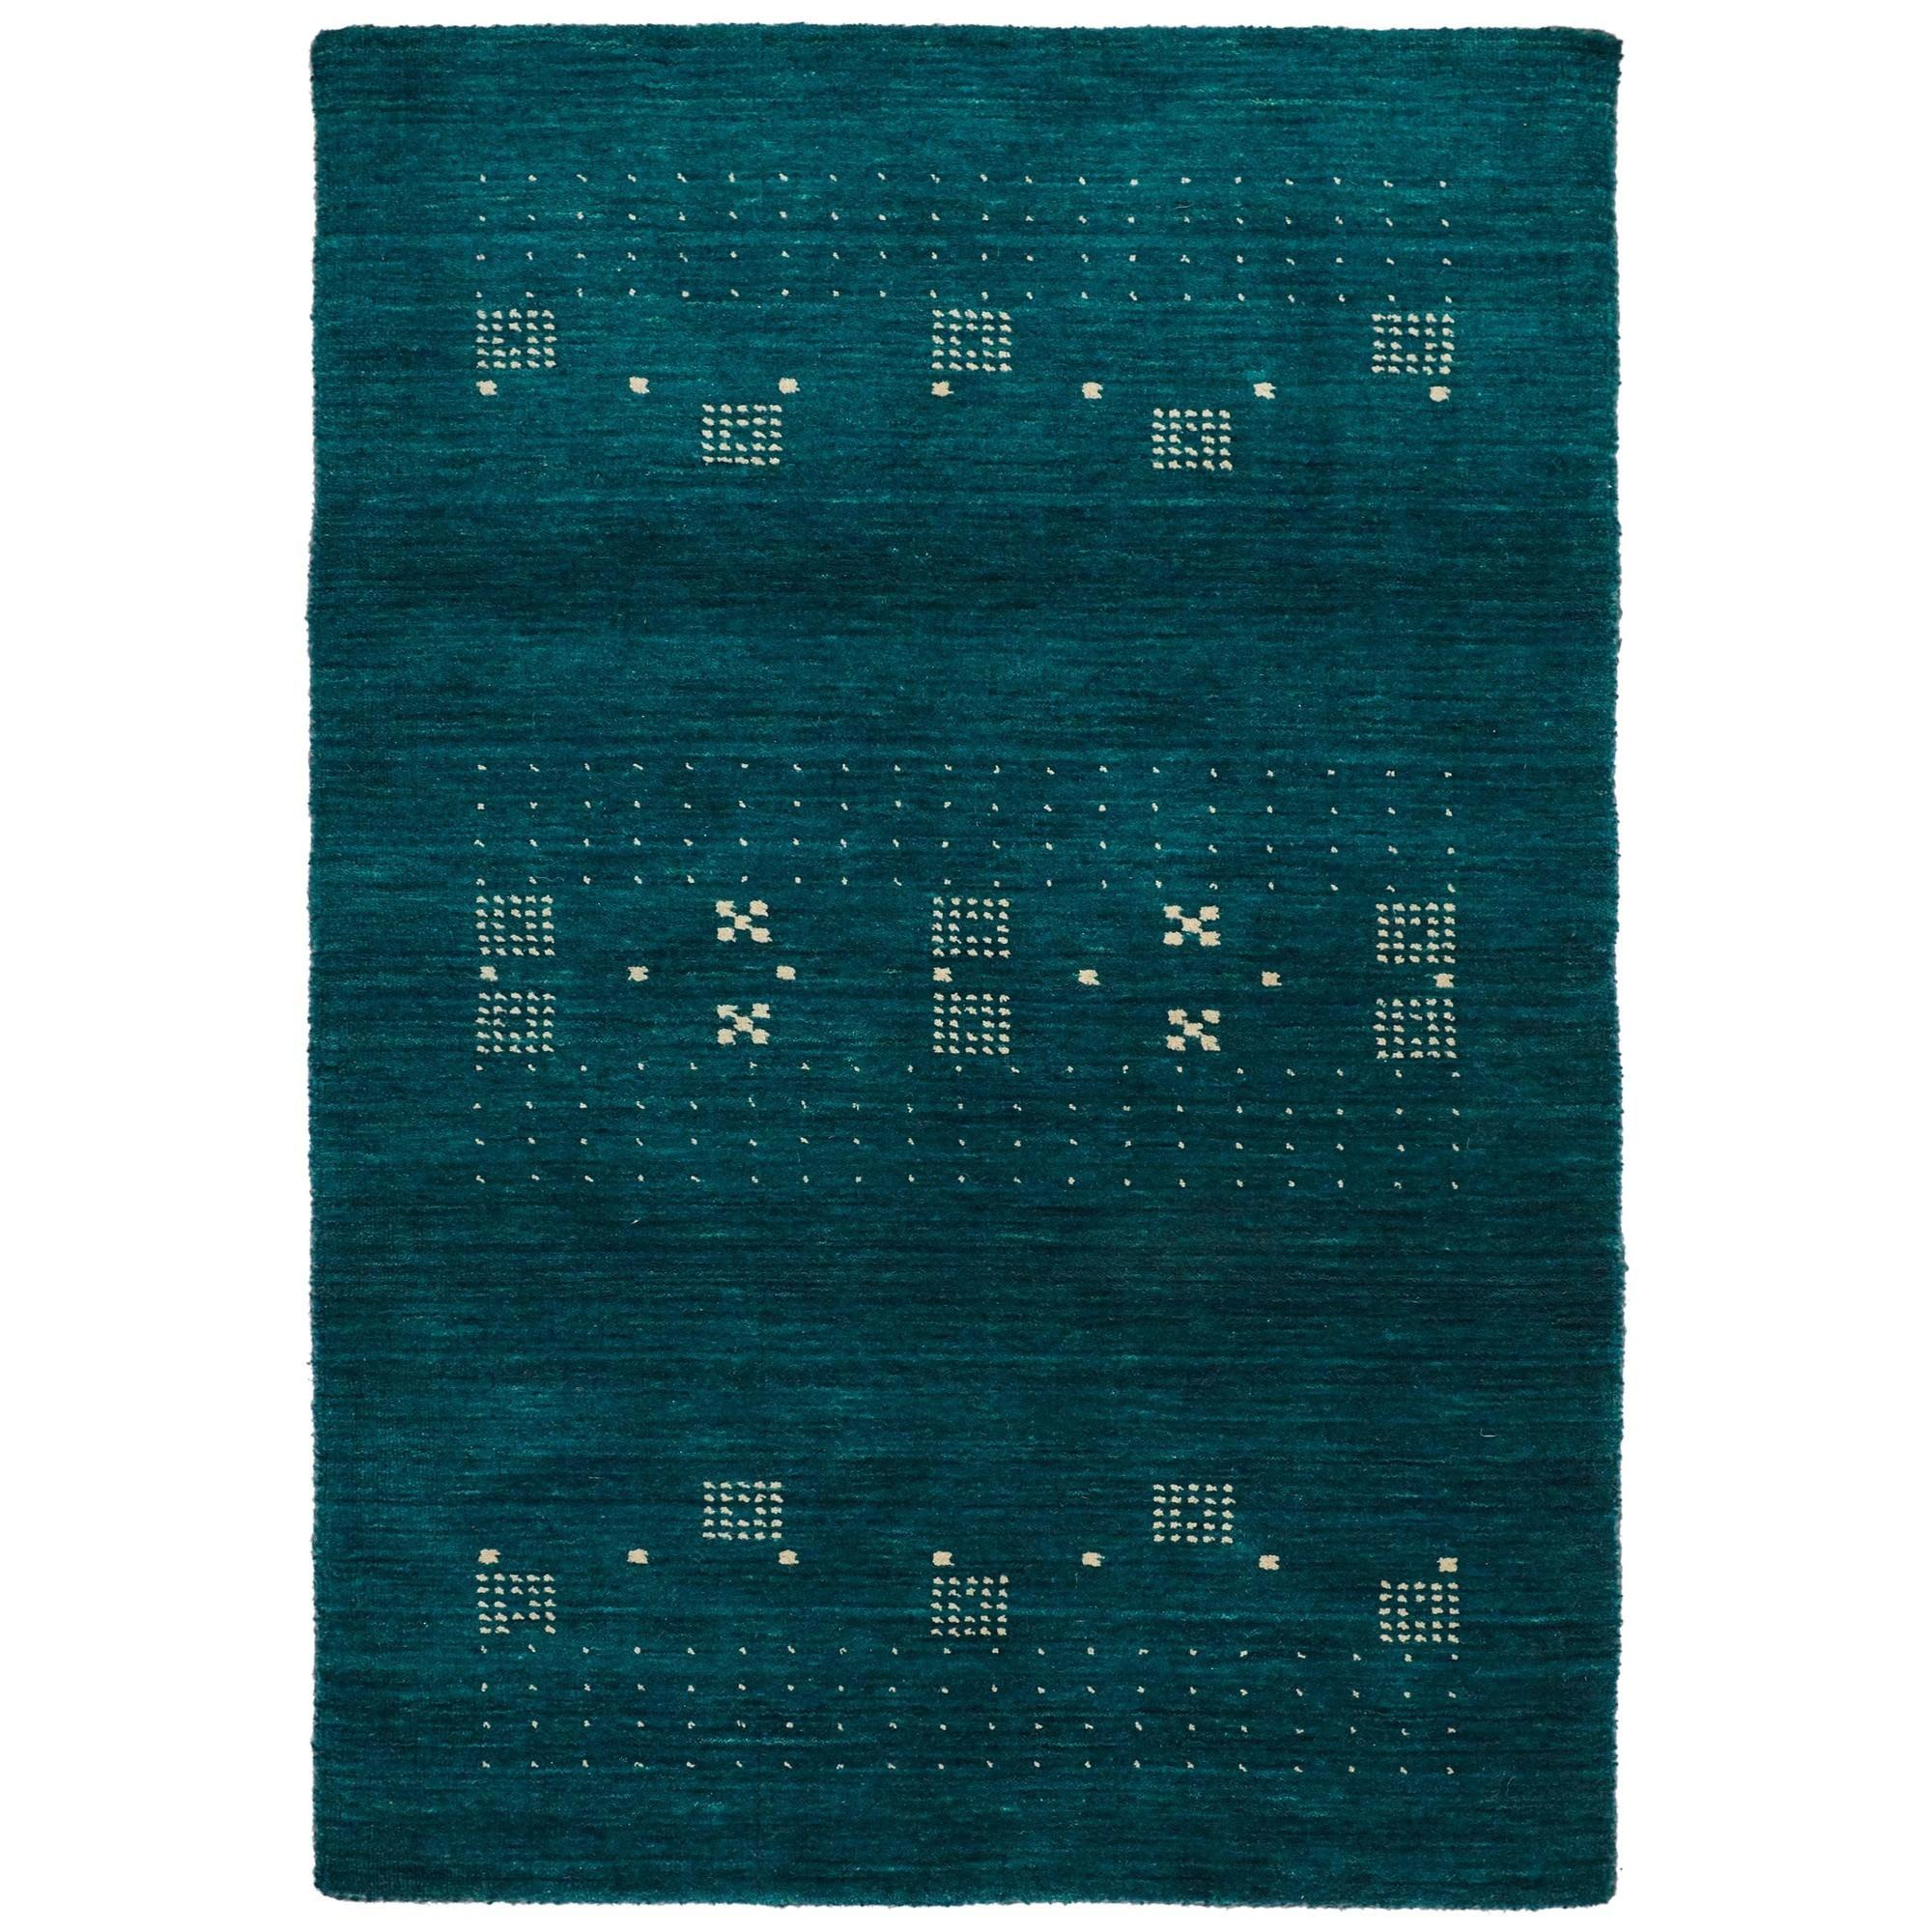 Lori No.042 Wool Tribal Rug, 330x240cm, Turquoise